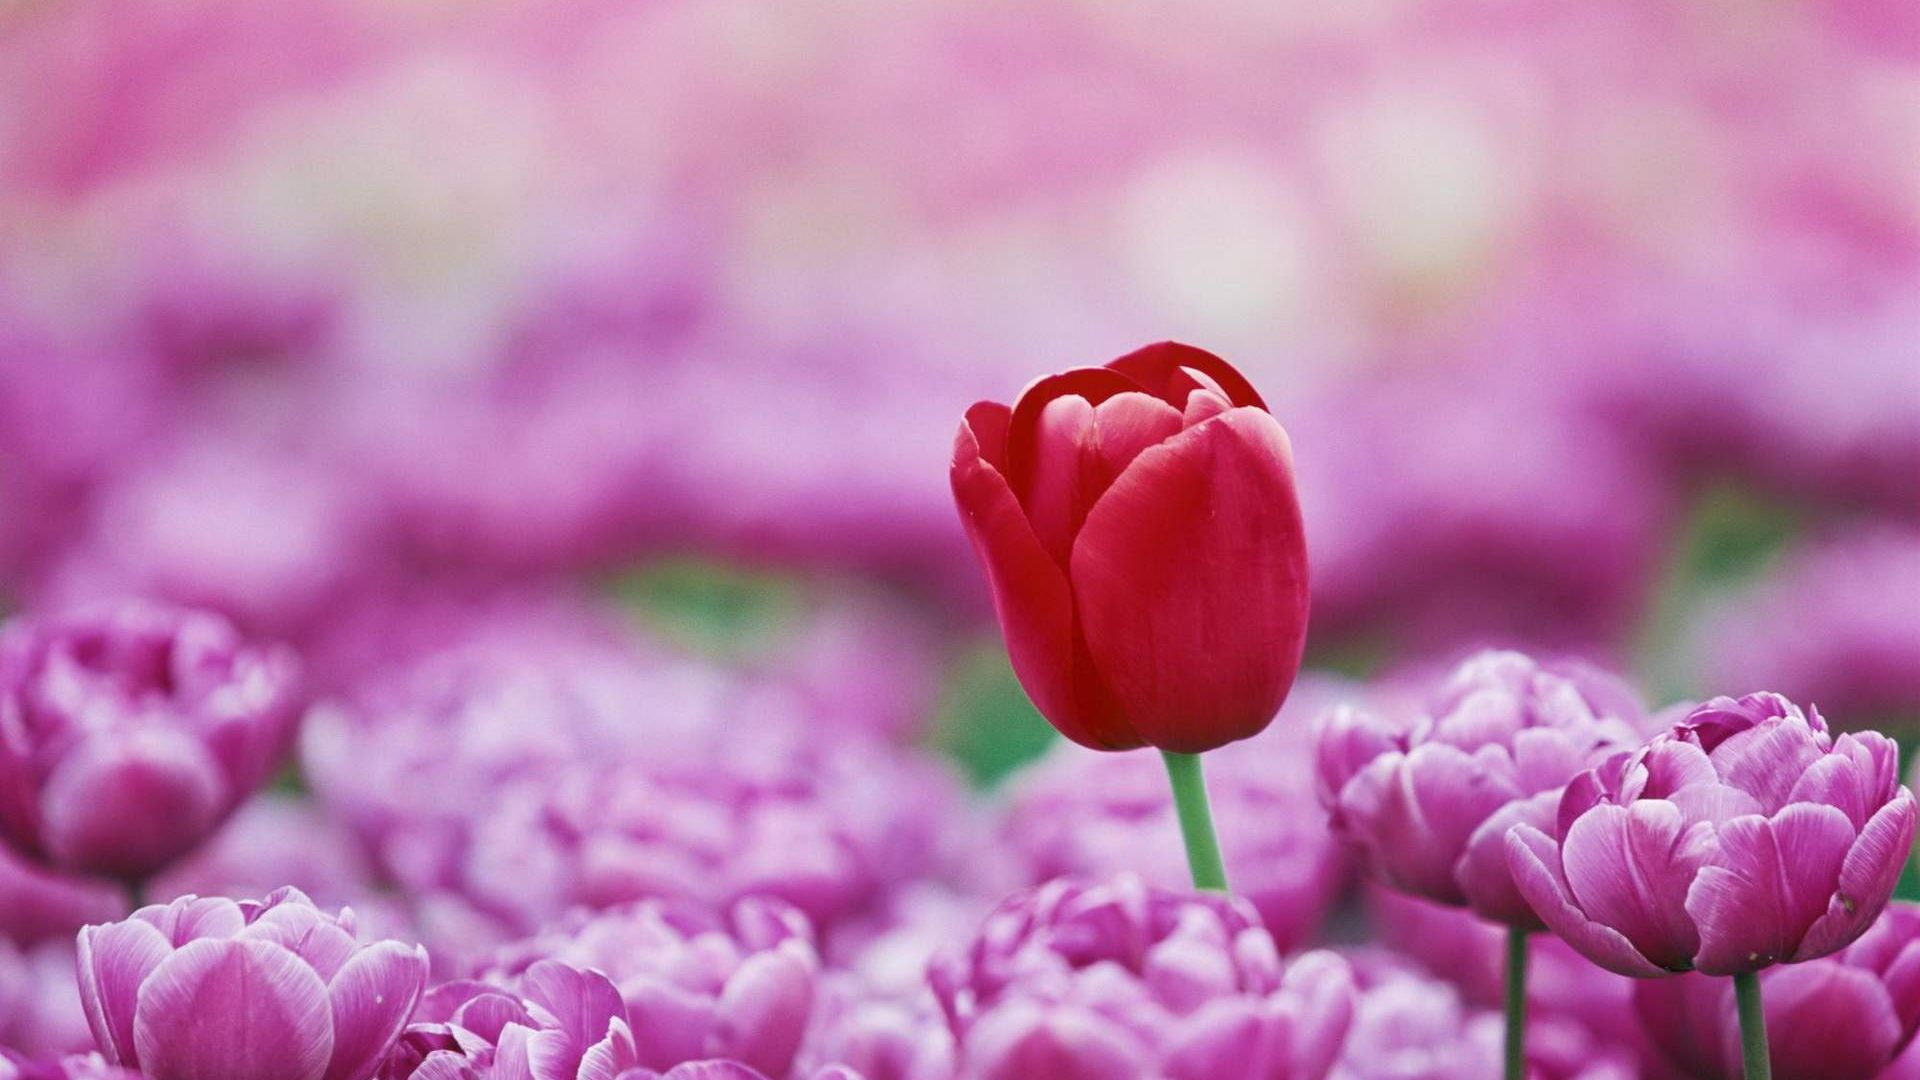 Red tulip, pink tulips farm, spring, blur